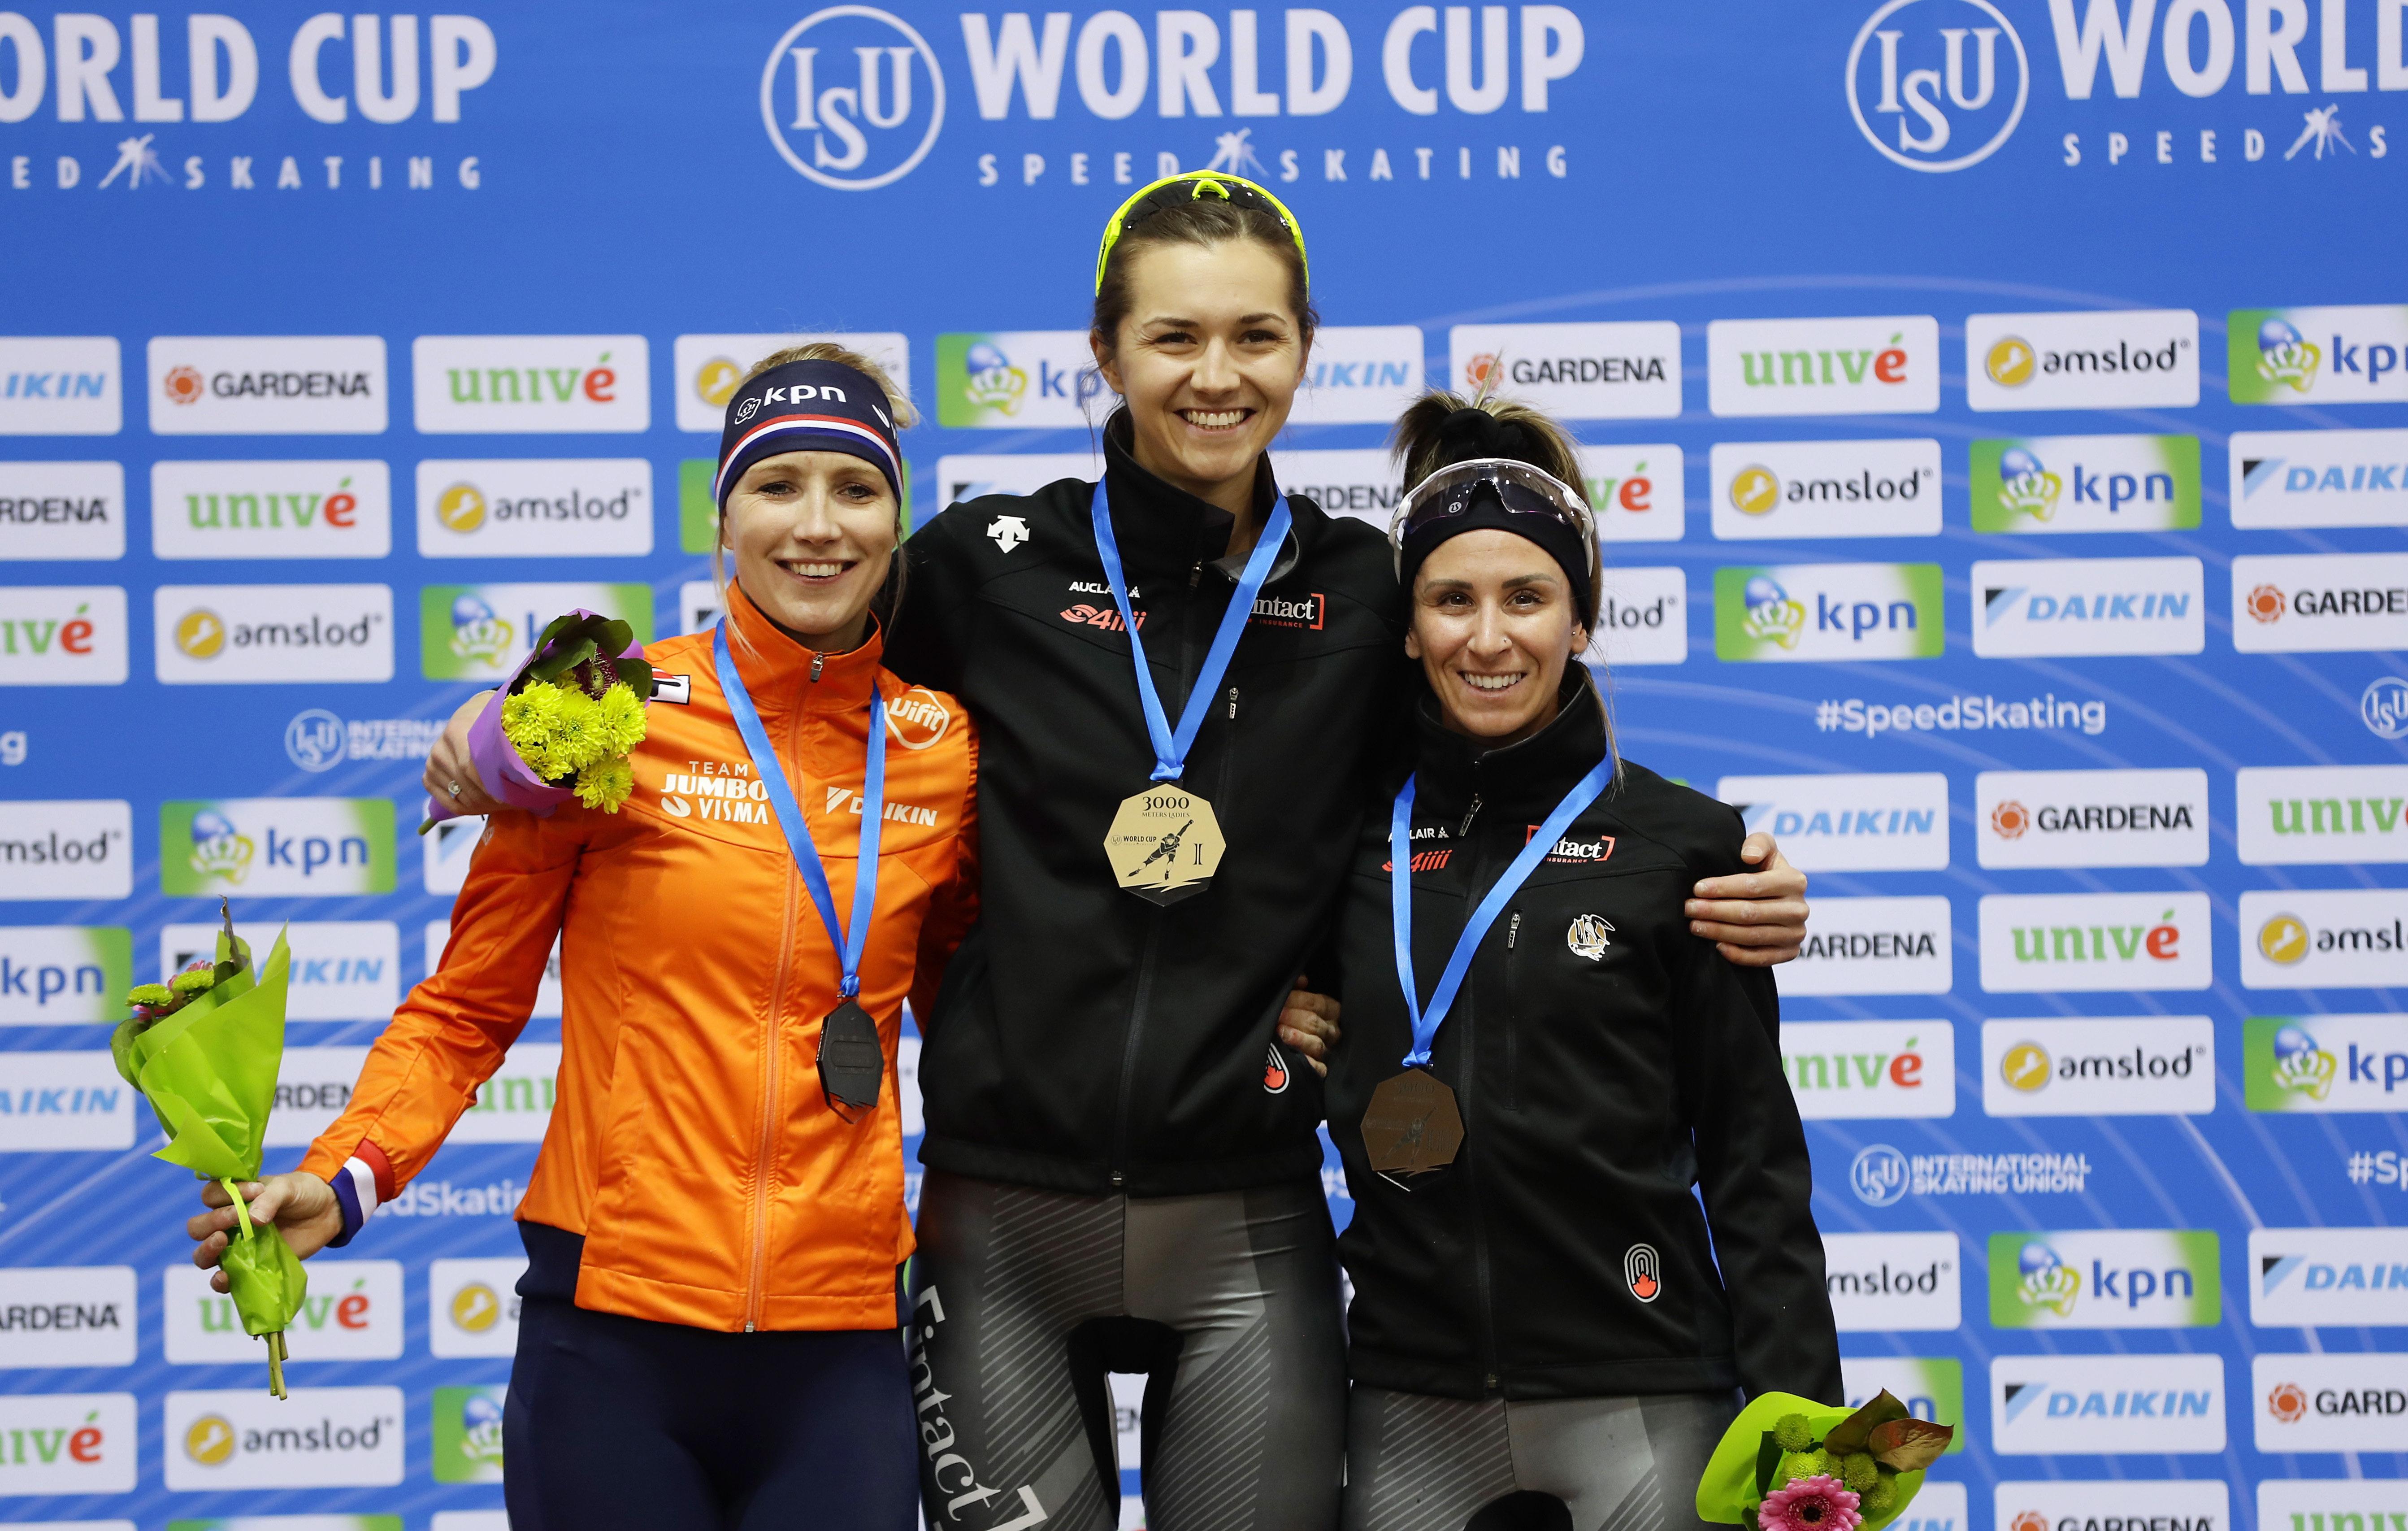 Speed skating medal winners on podium